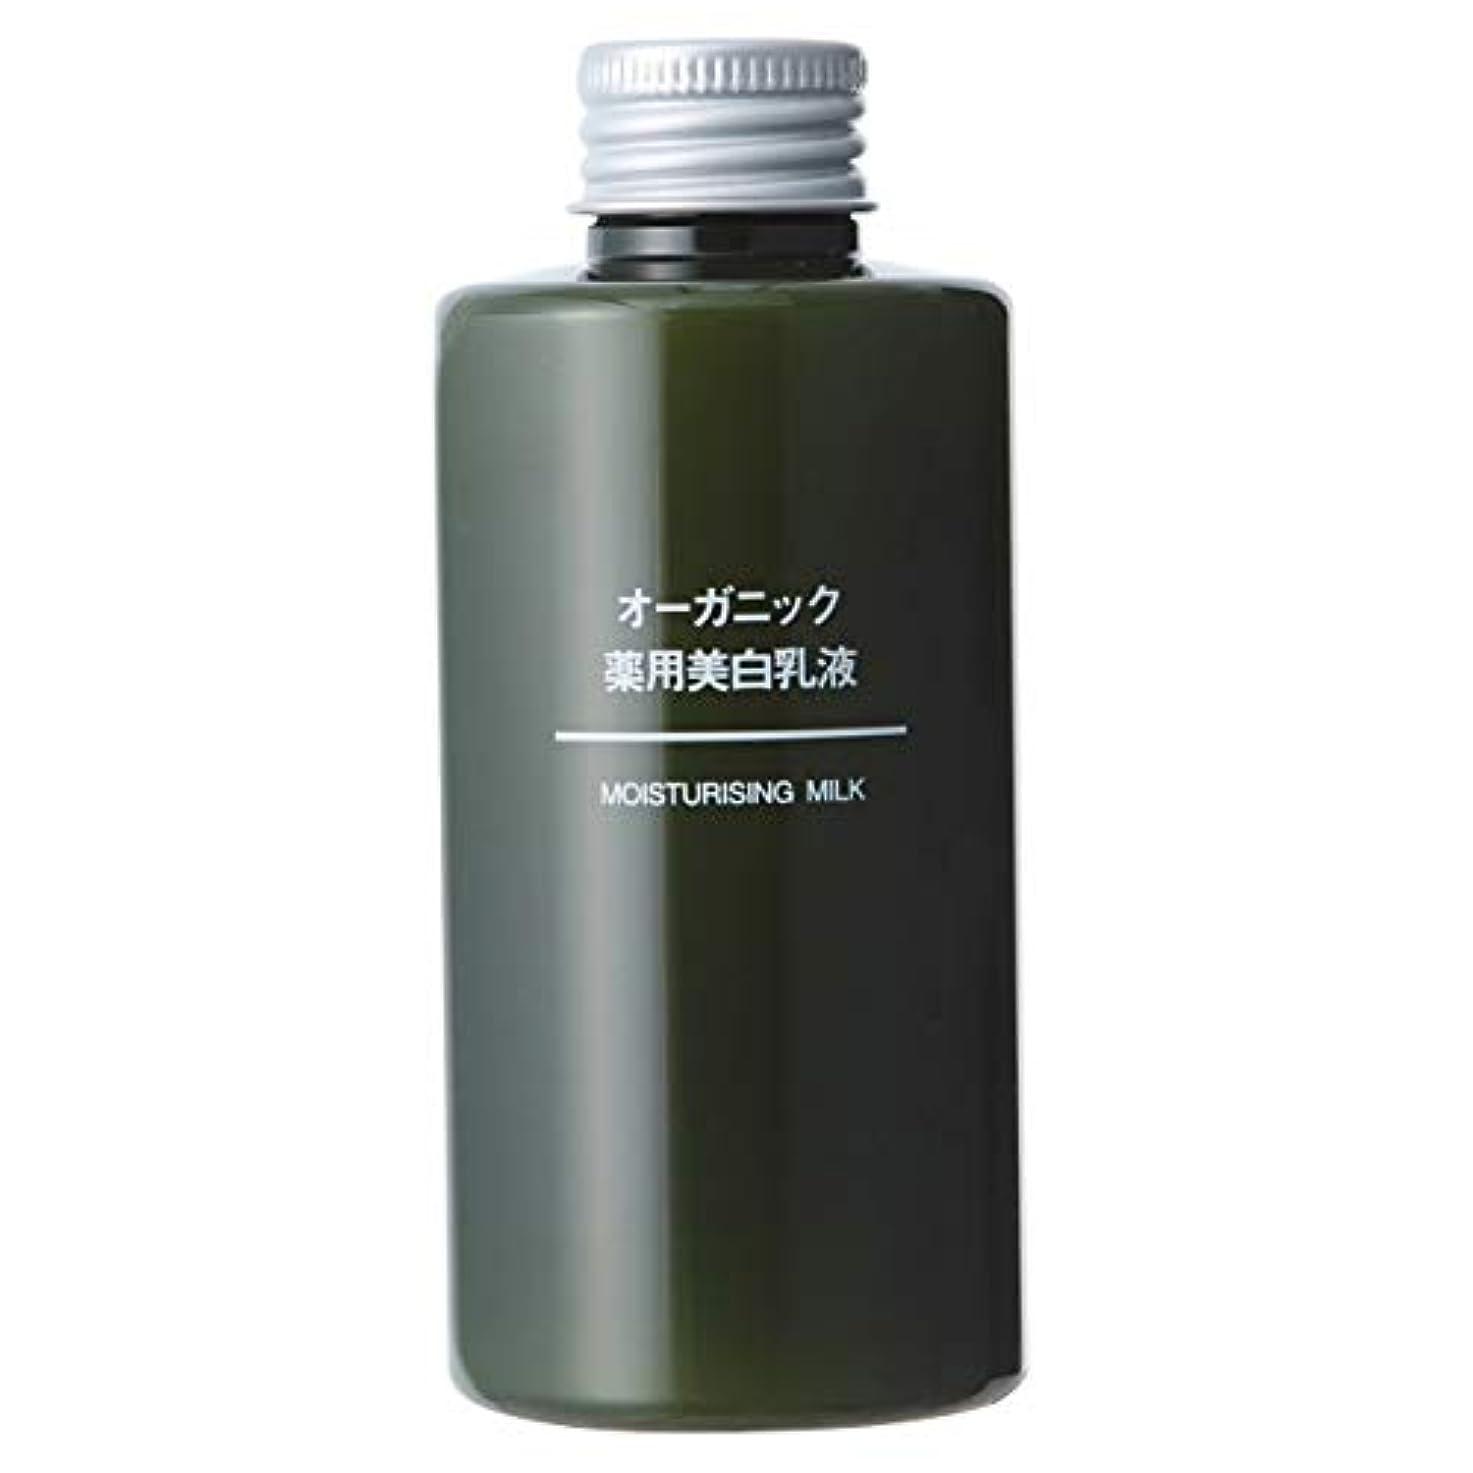 解任薬剤師制限無印良品 オーガニック薬用美白乳液 (新)150ml